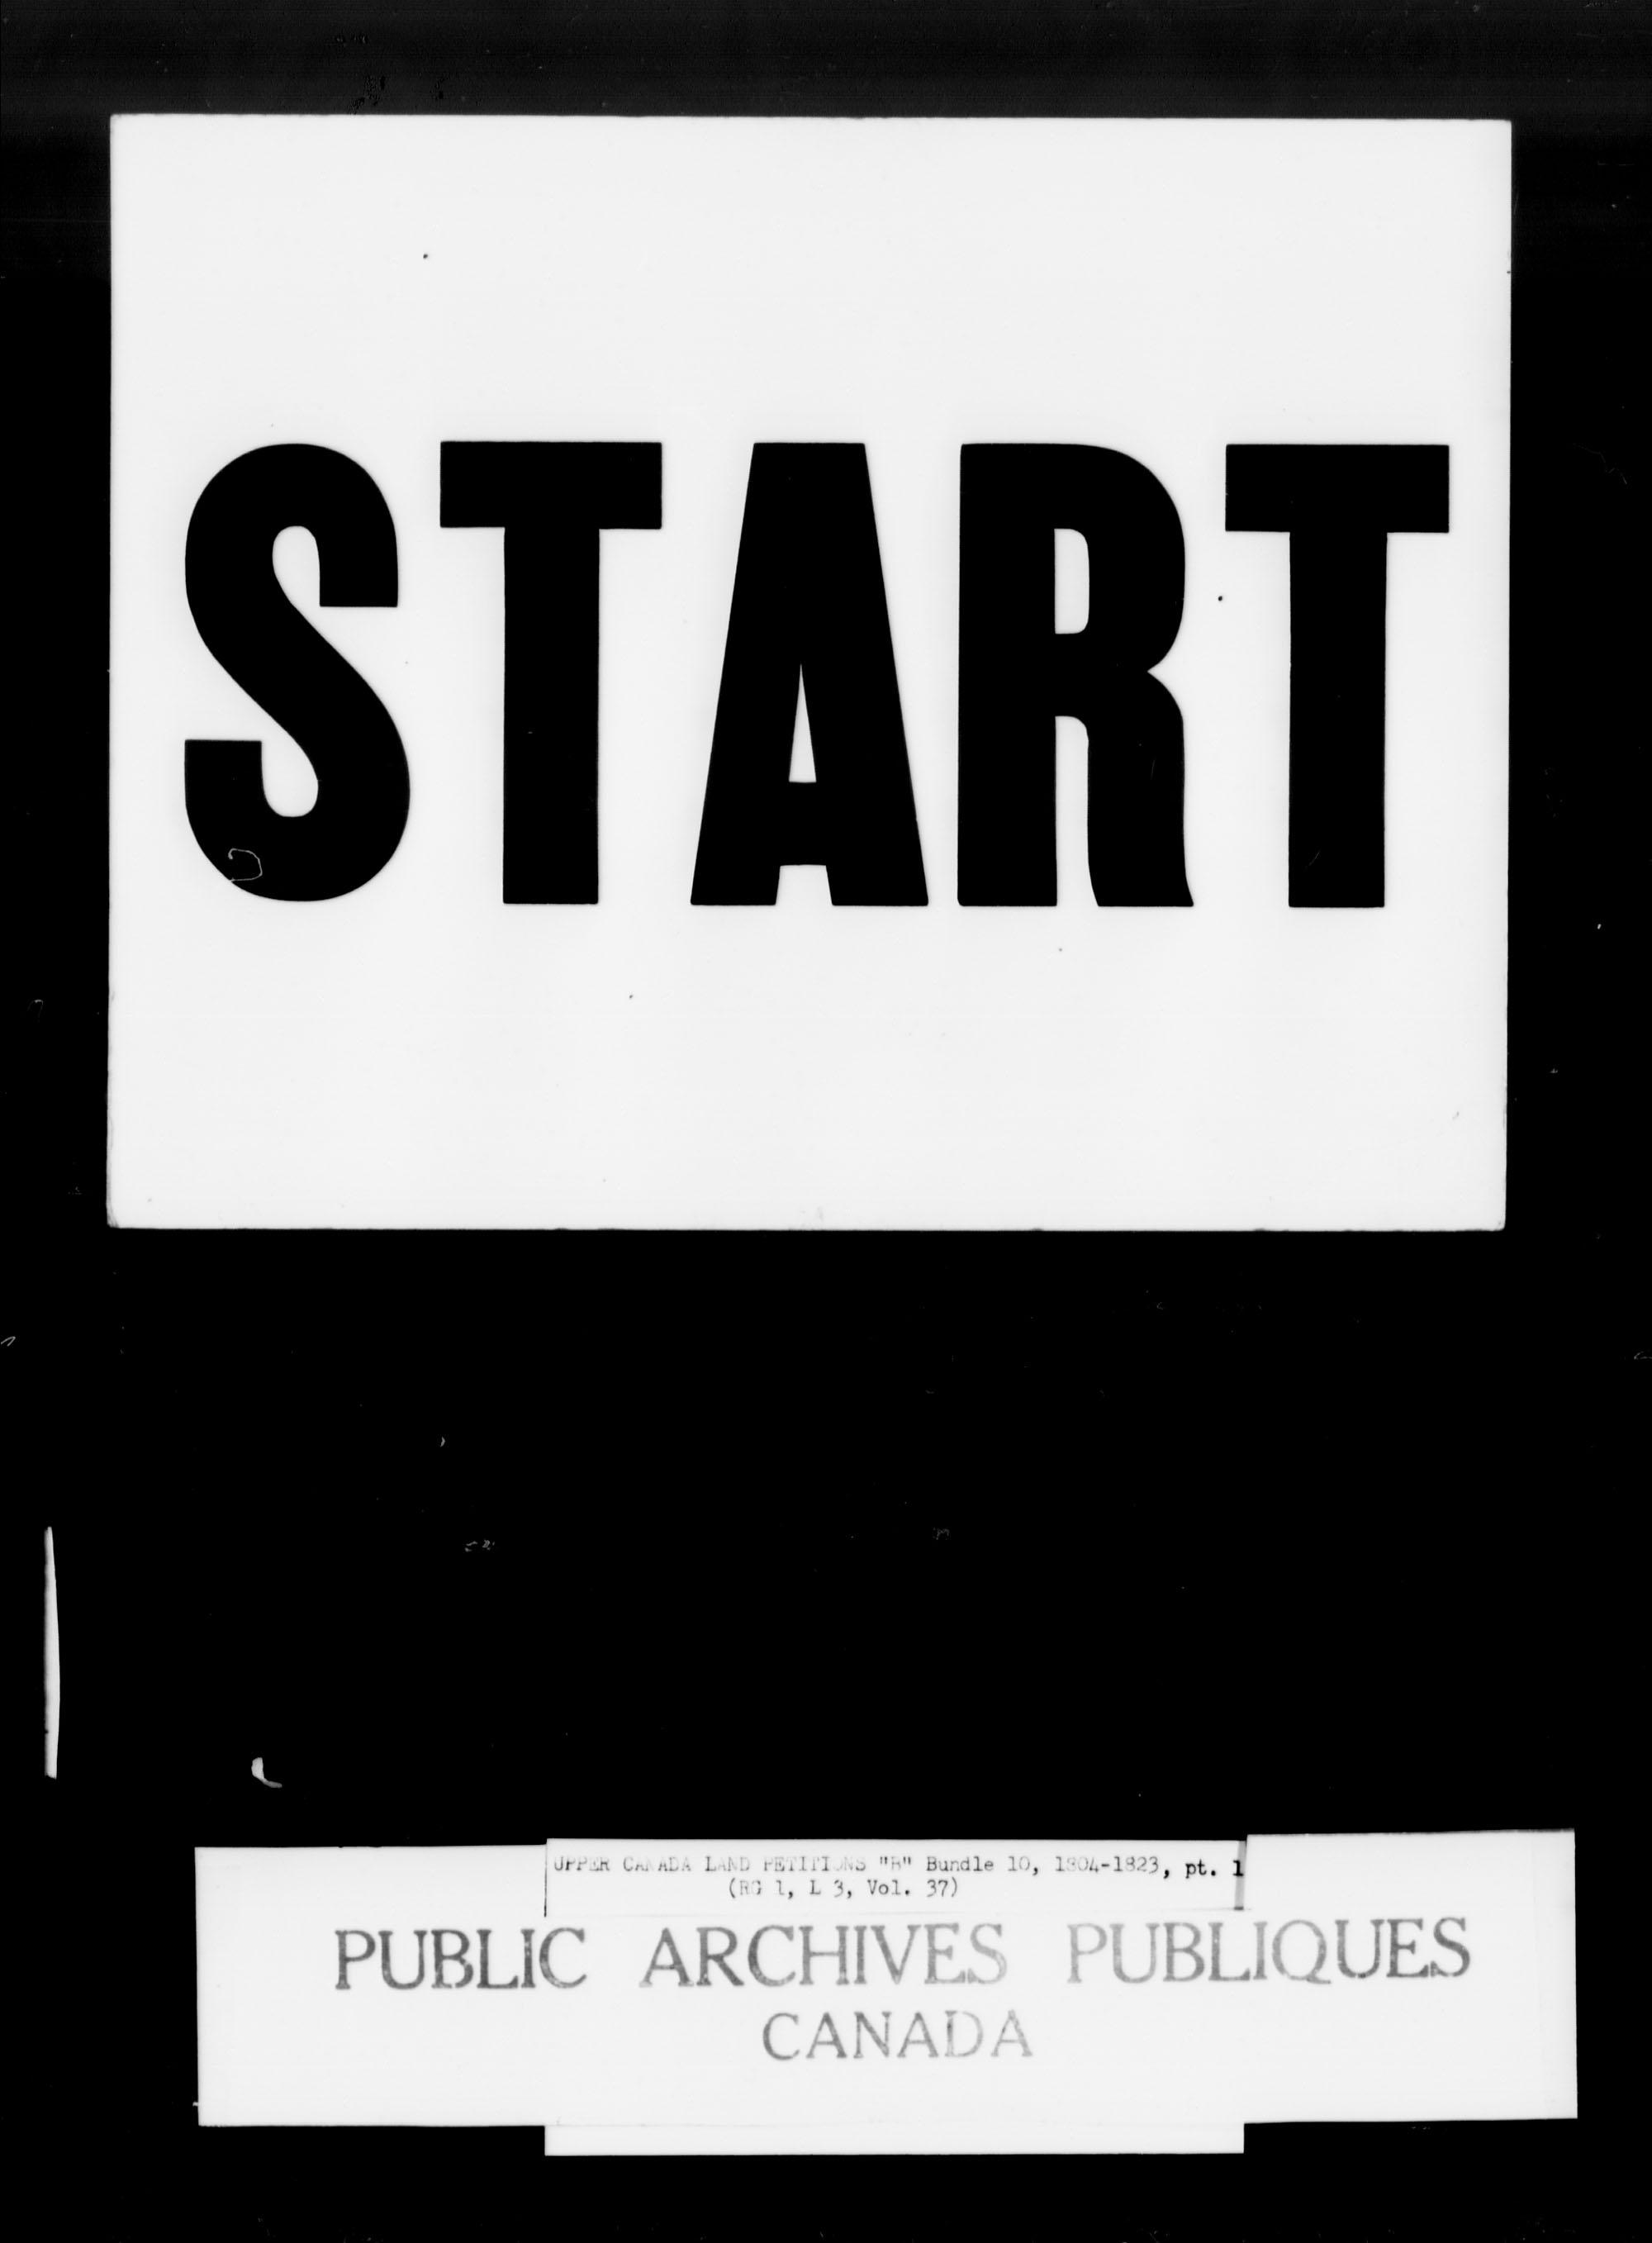 Titre: Demandes de terres du Haut-Canada (1763-1865) - N° d'enregistrement Mikan: 205131 - Microforme: c-1623